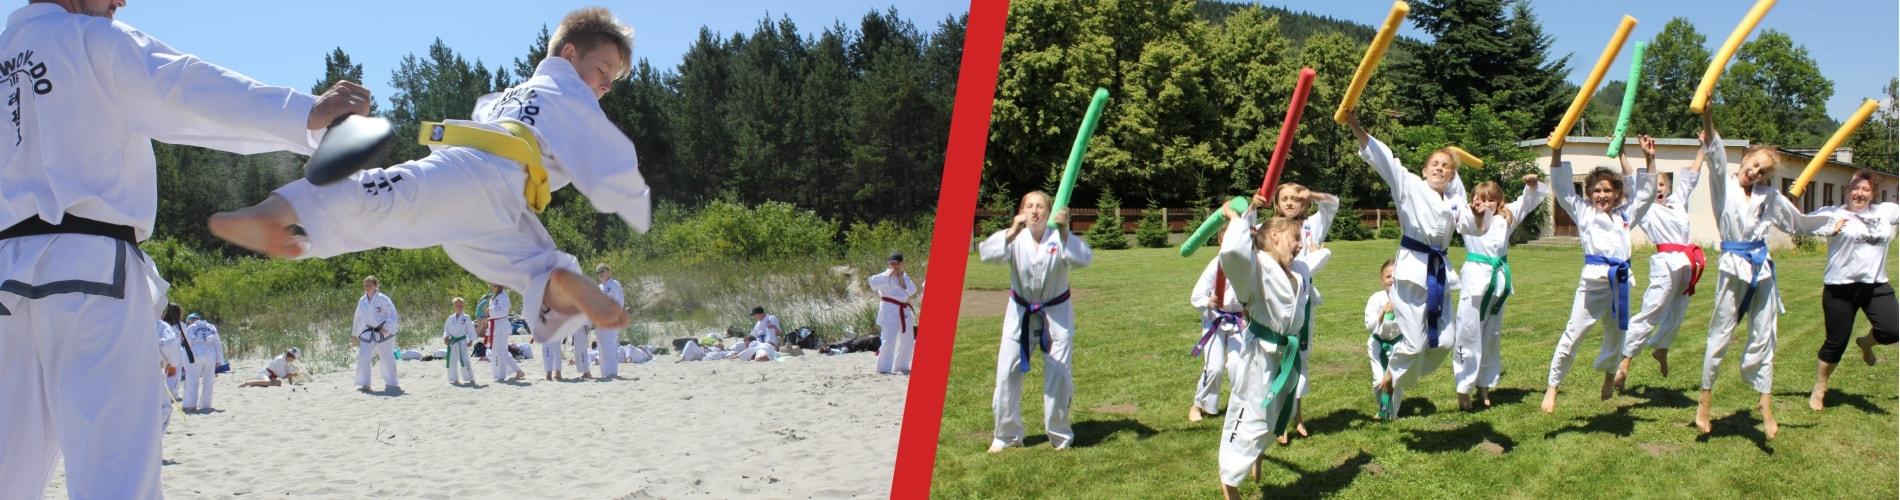 obozy taekwondo